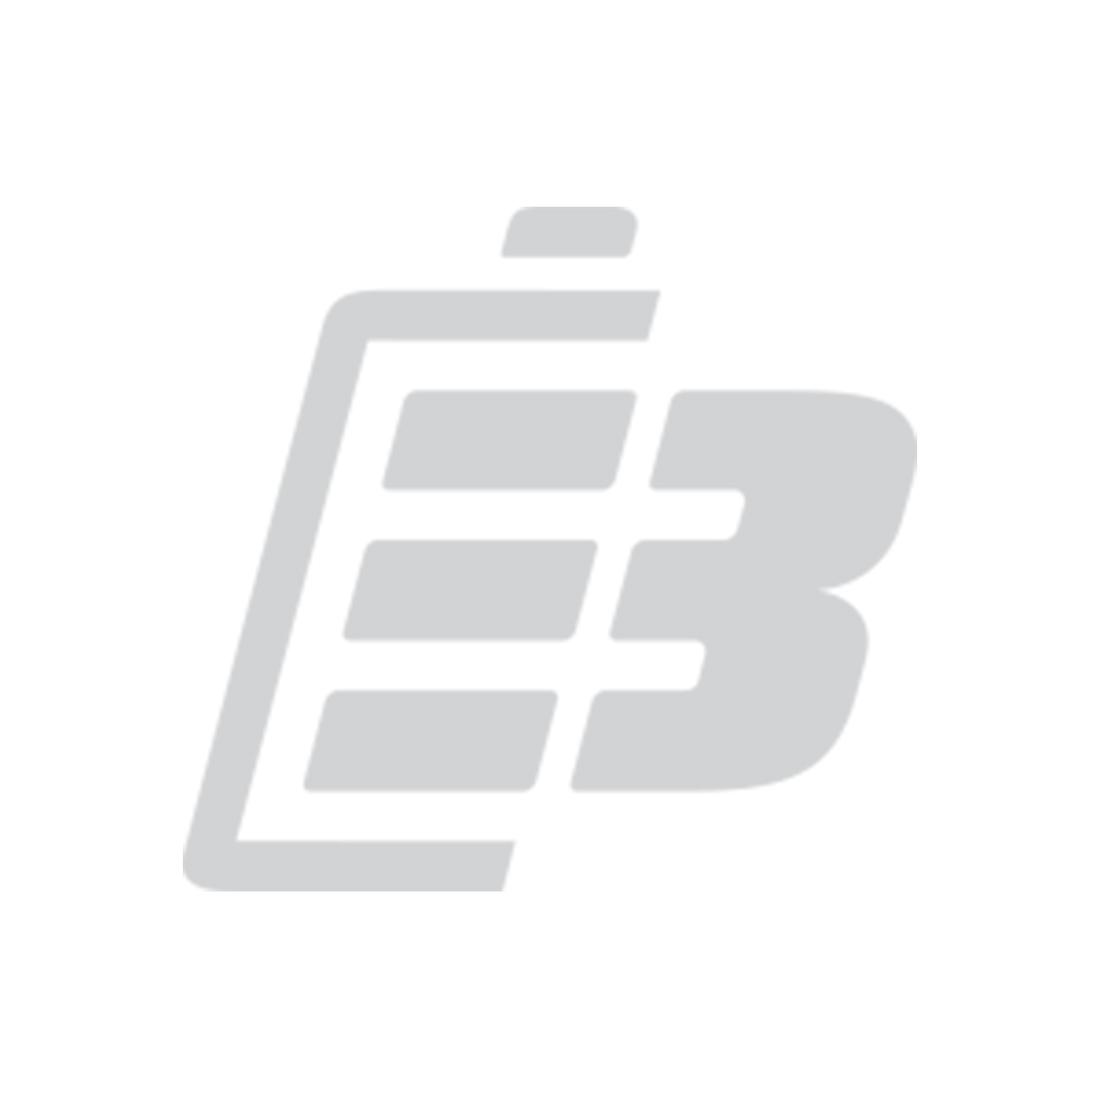 Energizer Lithium CR123A 3V